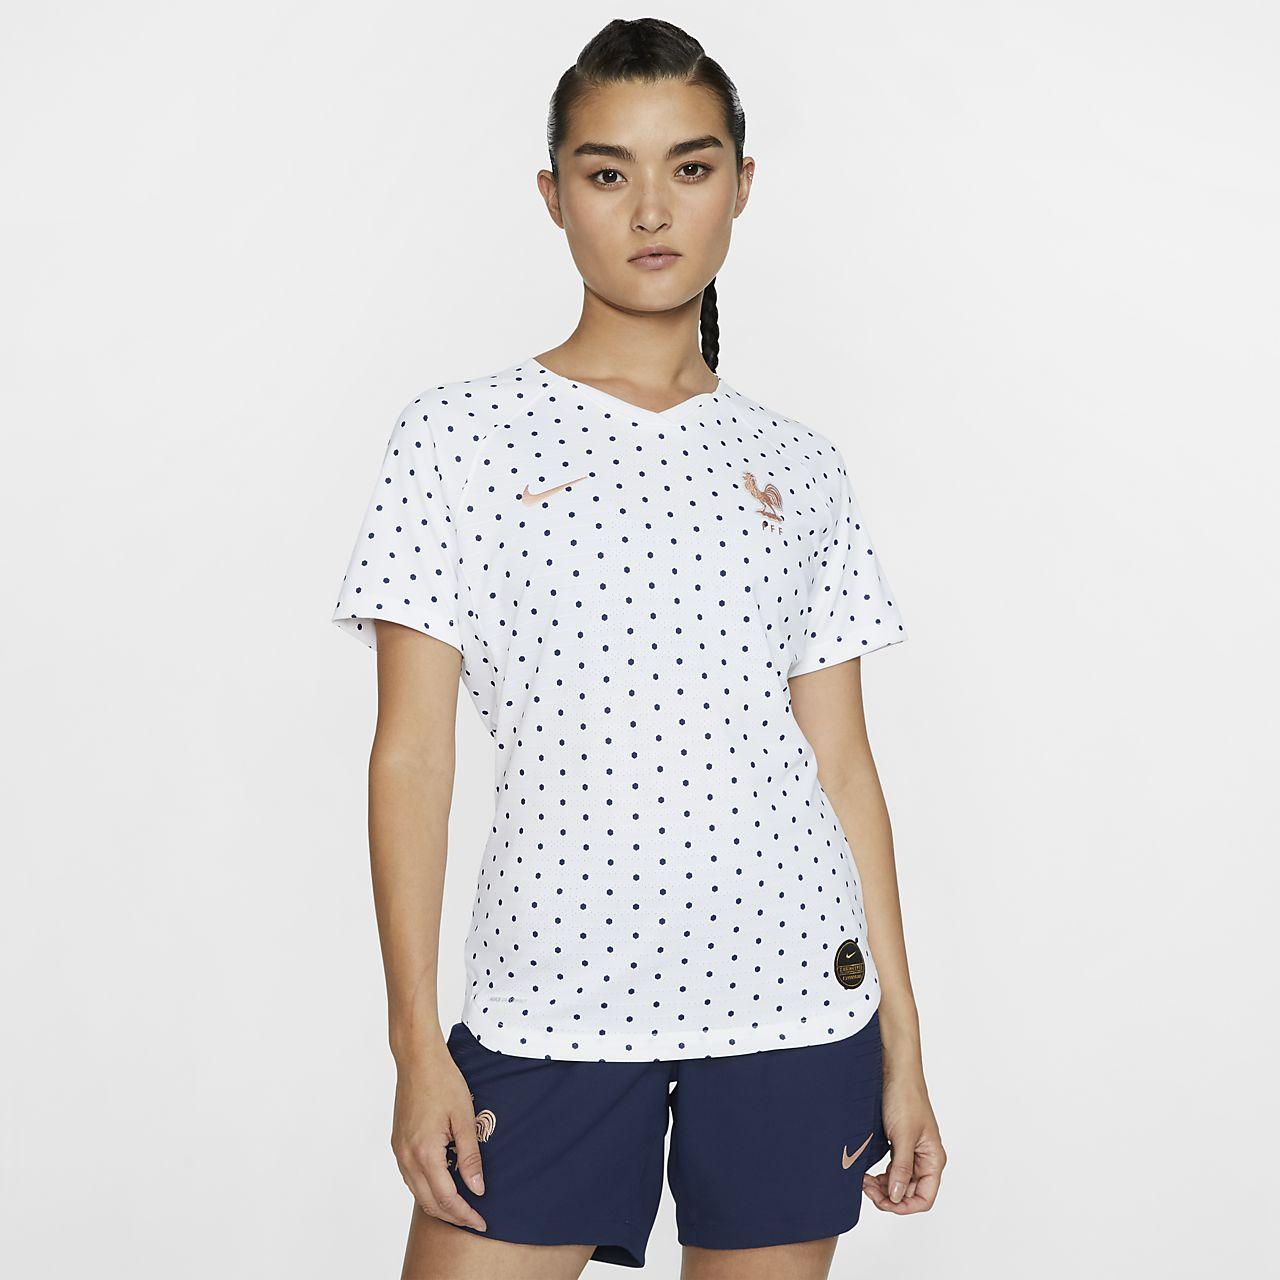 Camiseta de fútbol para mujer FFF 2019 Vapor Match Away